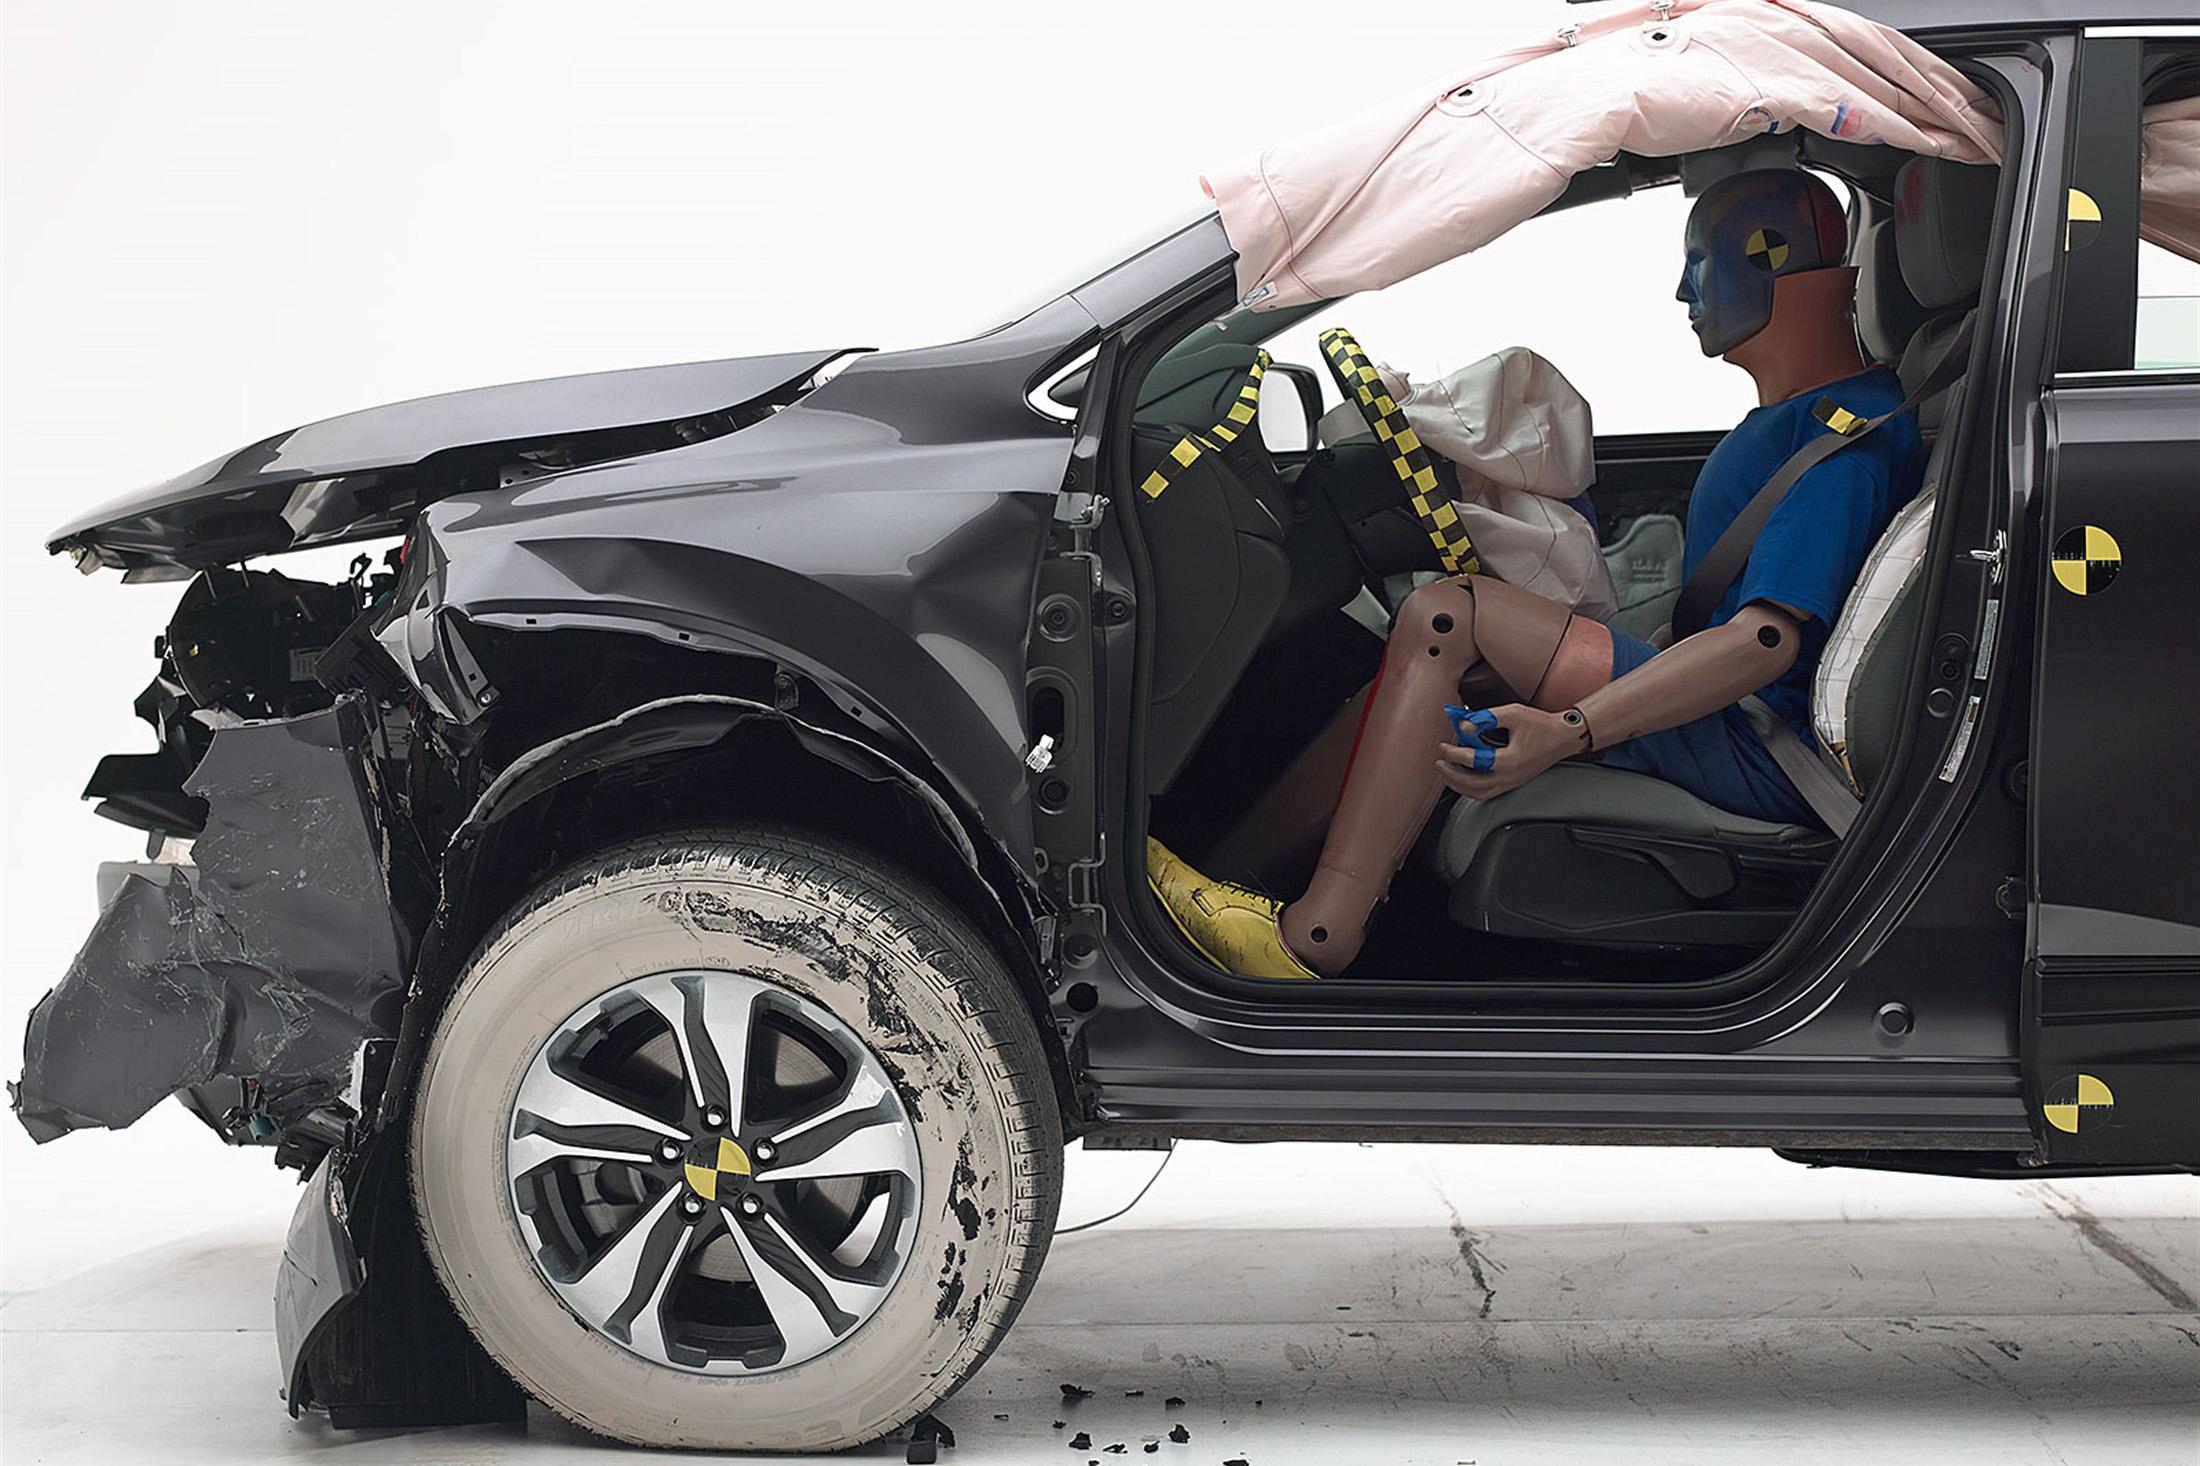 2020 Honda CR-V Hybrid Is a Safe Choice for Eco-Friendly Families